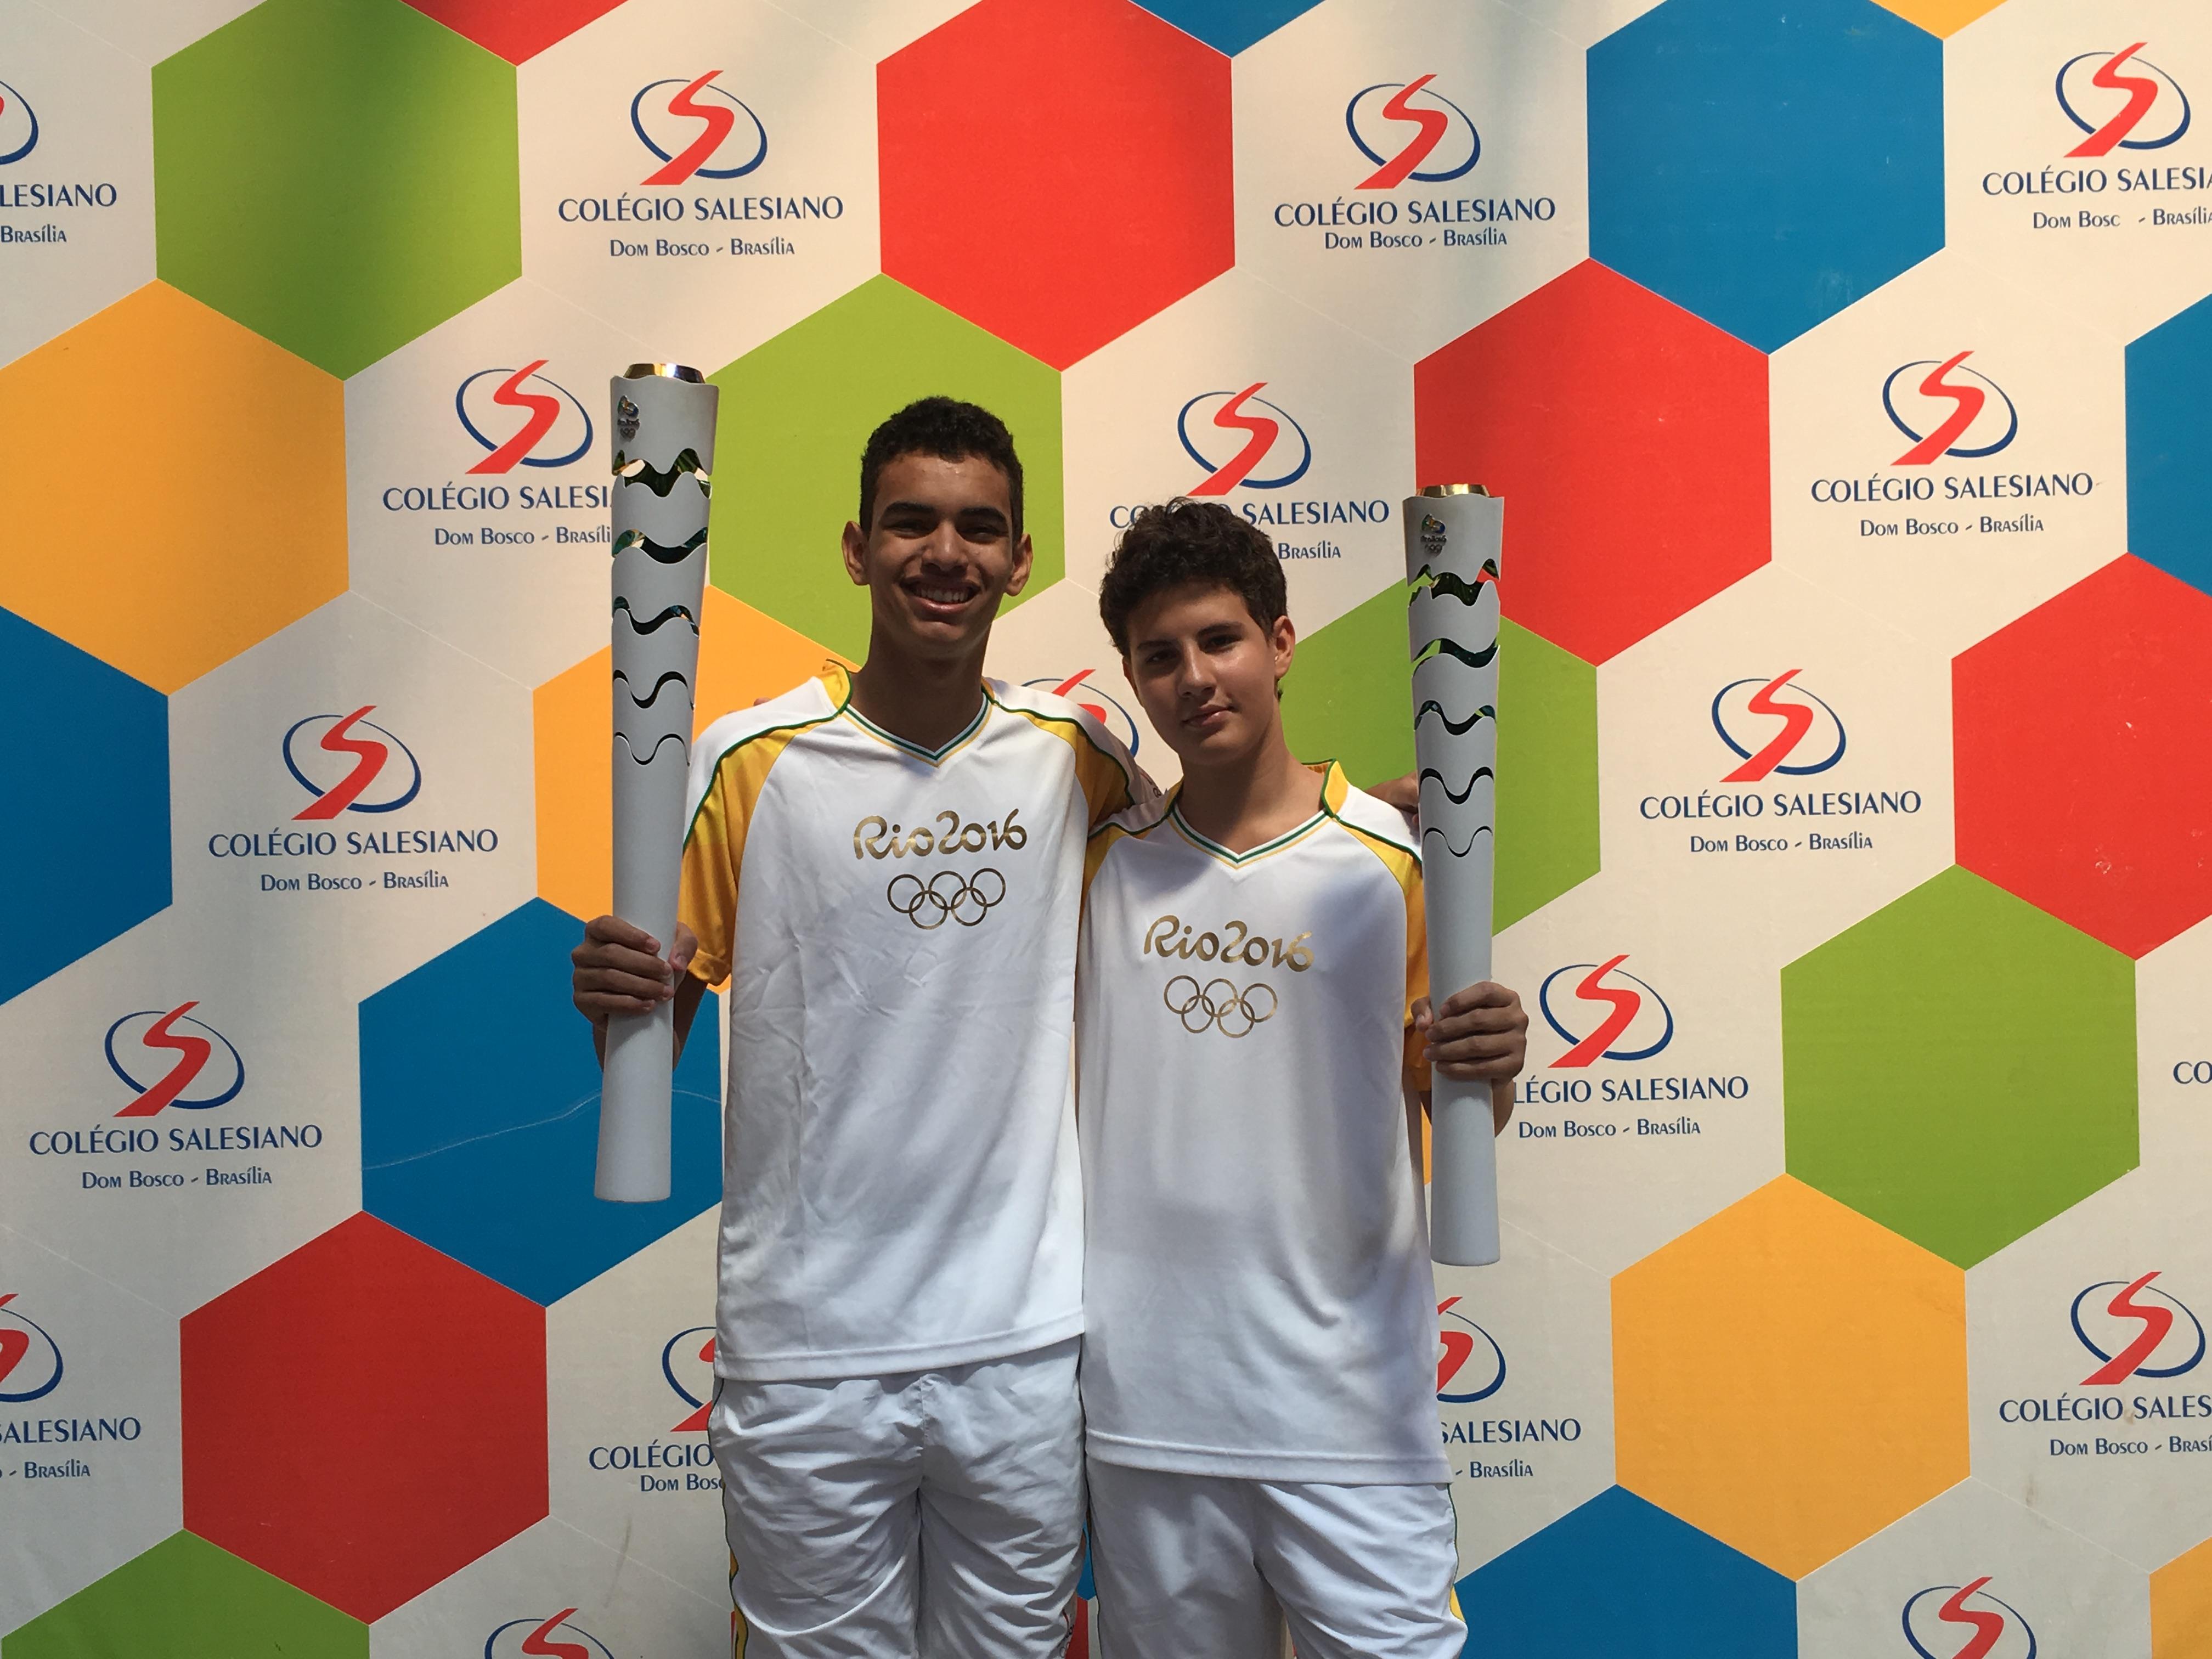 Alunos de escola salesiana de Brasília participam do revezamento da tocha olímpica